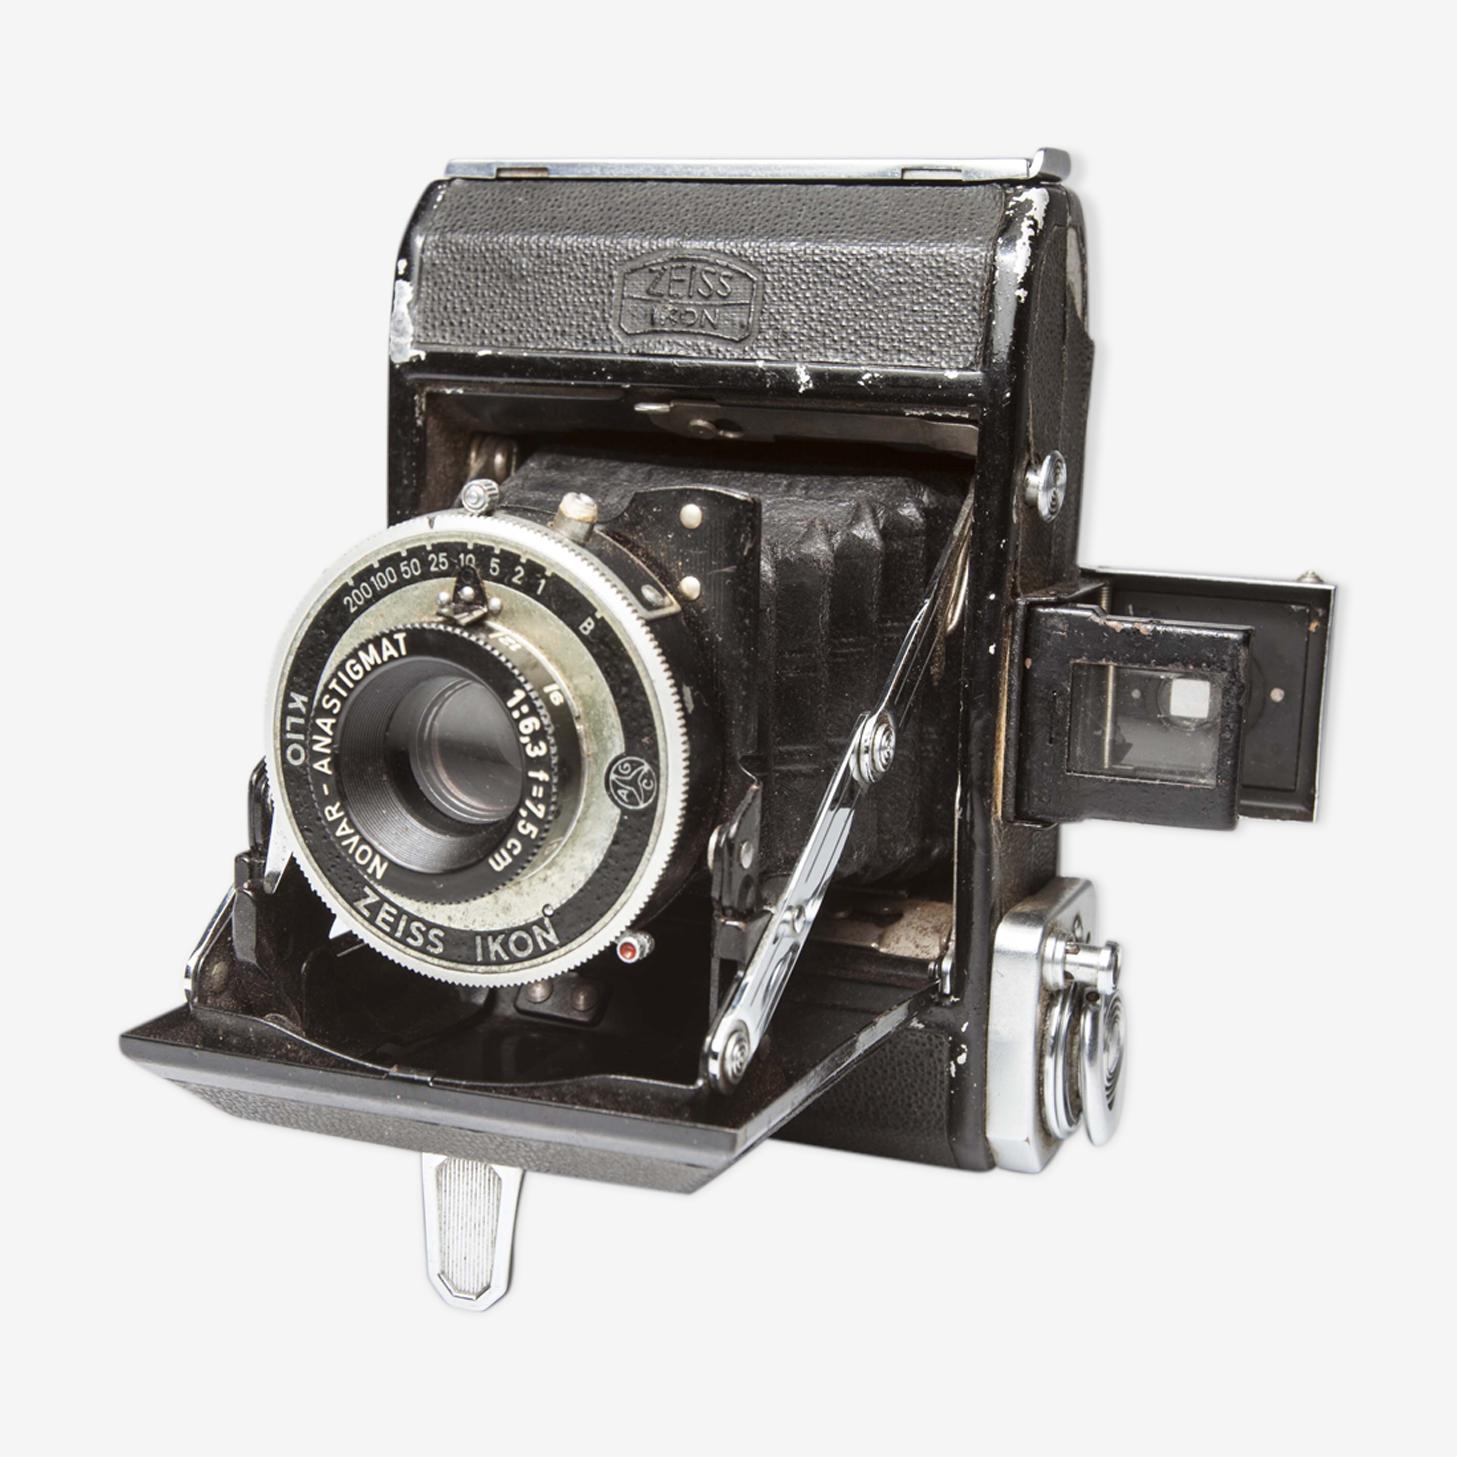 Zeiss ikon ikonta 521 1938 compact bellows